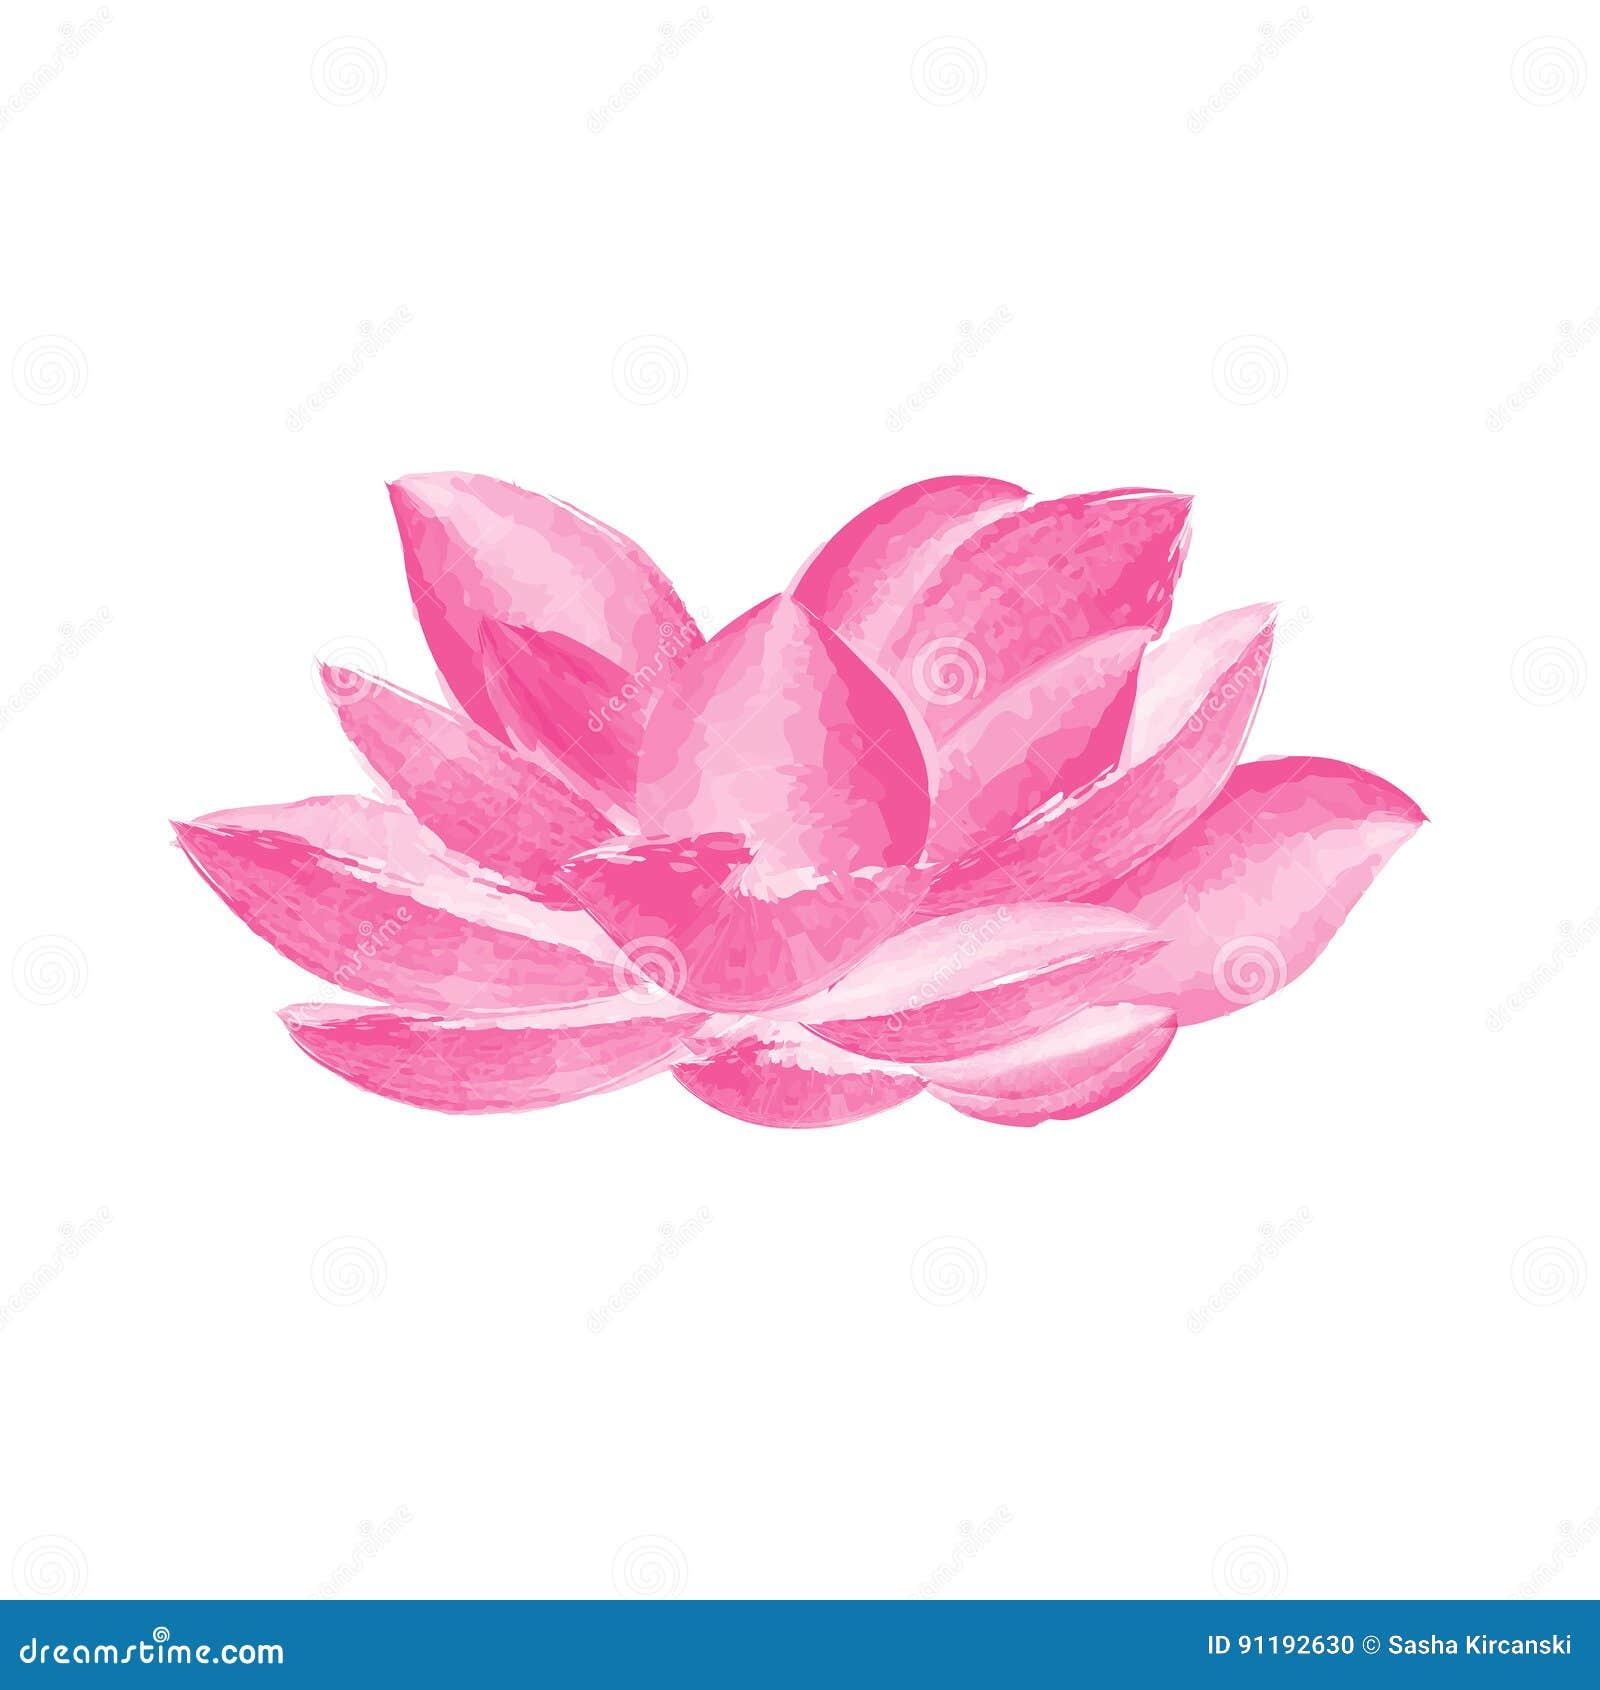 Watercolor lotus flower stock vector illustration of paint 91192630 watercolor lotus flower paint water izmirmasajfo